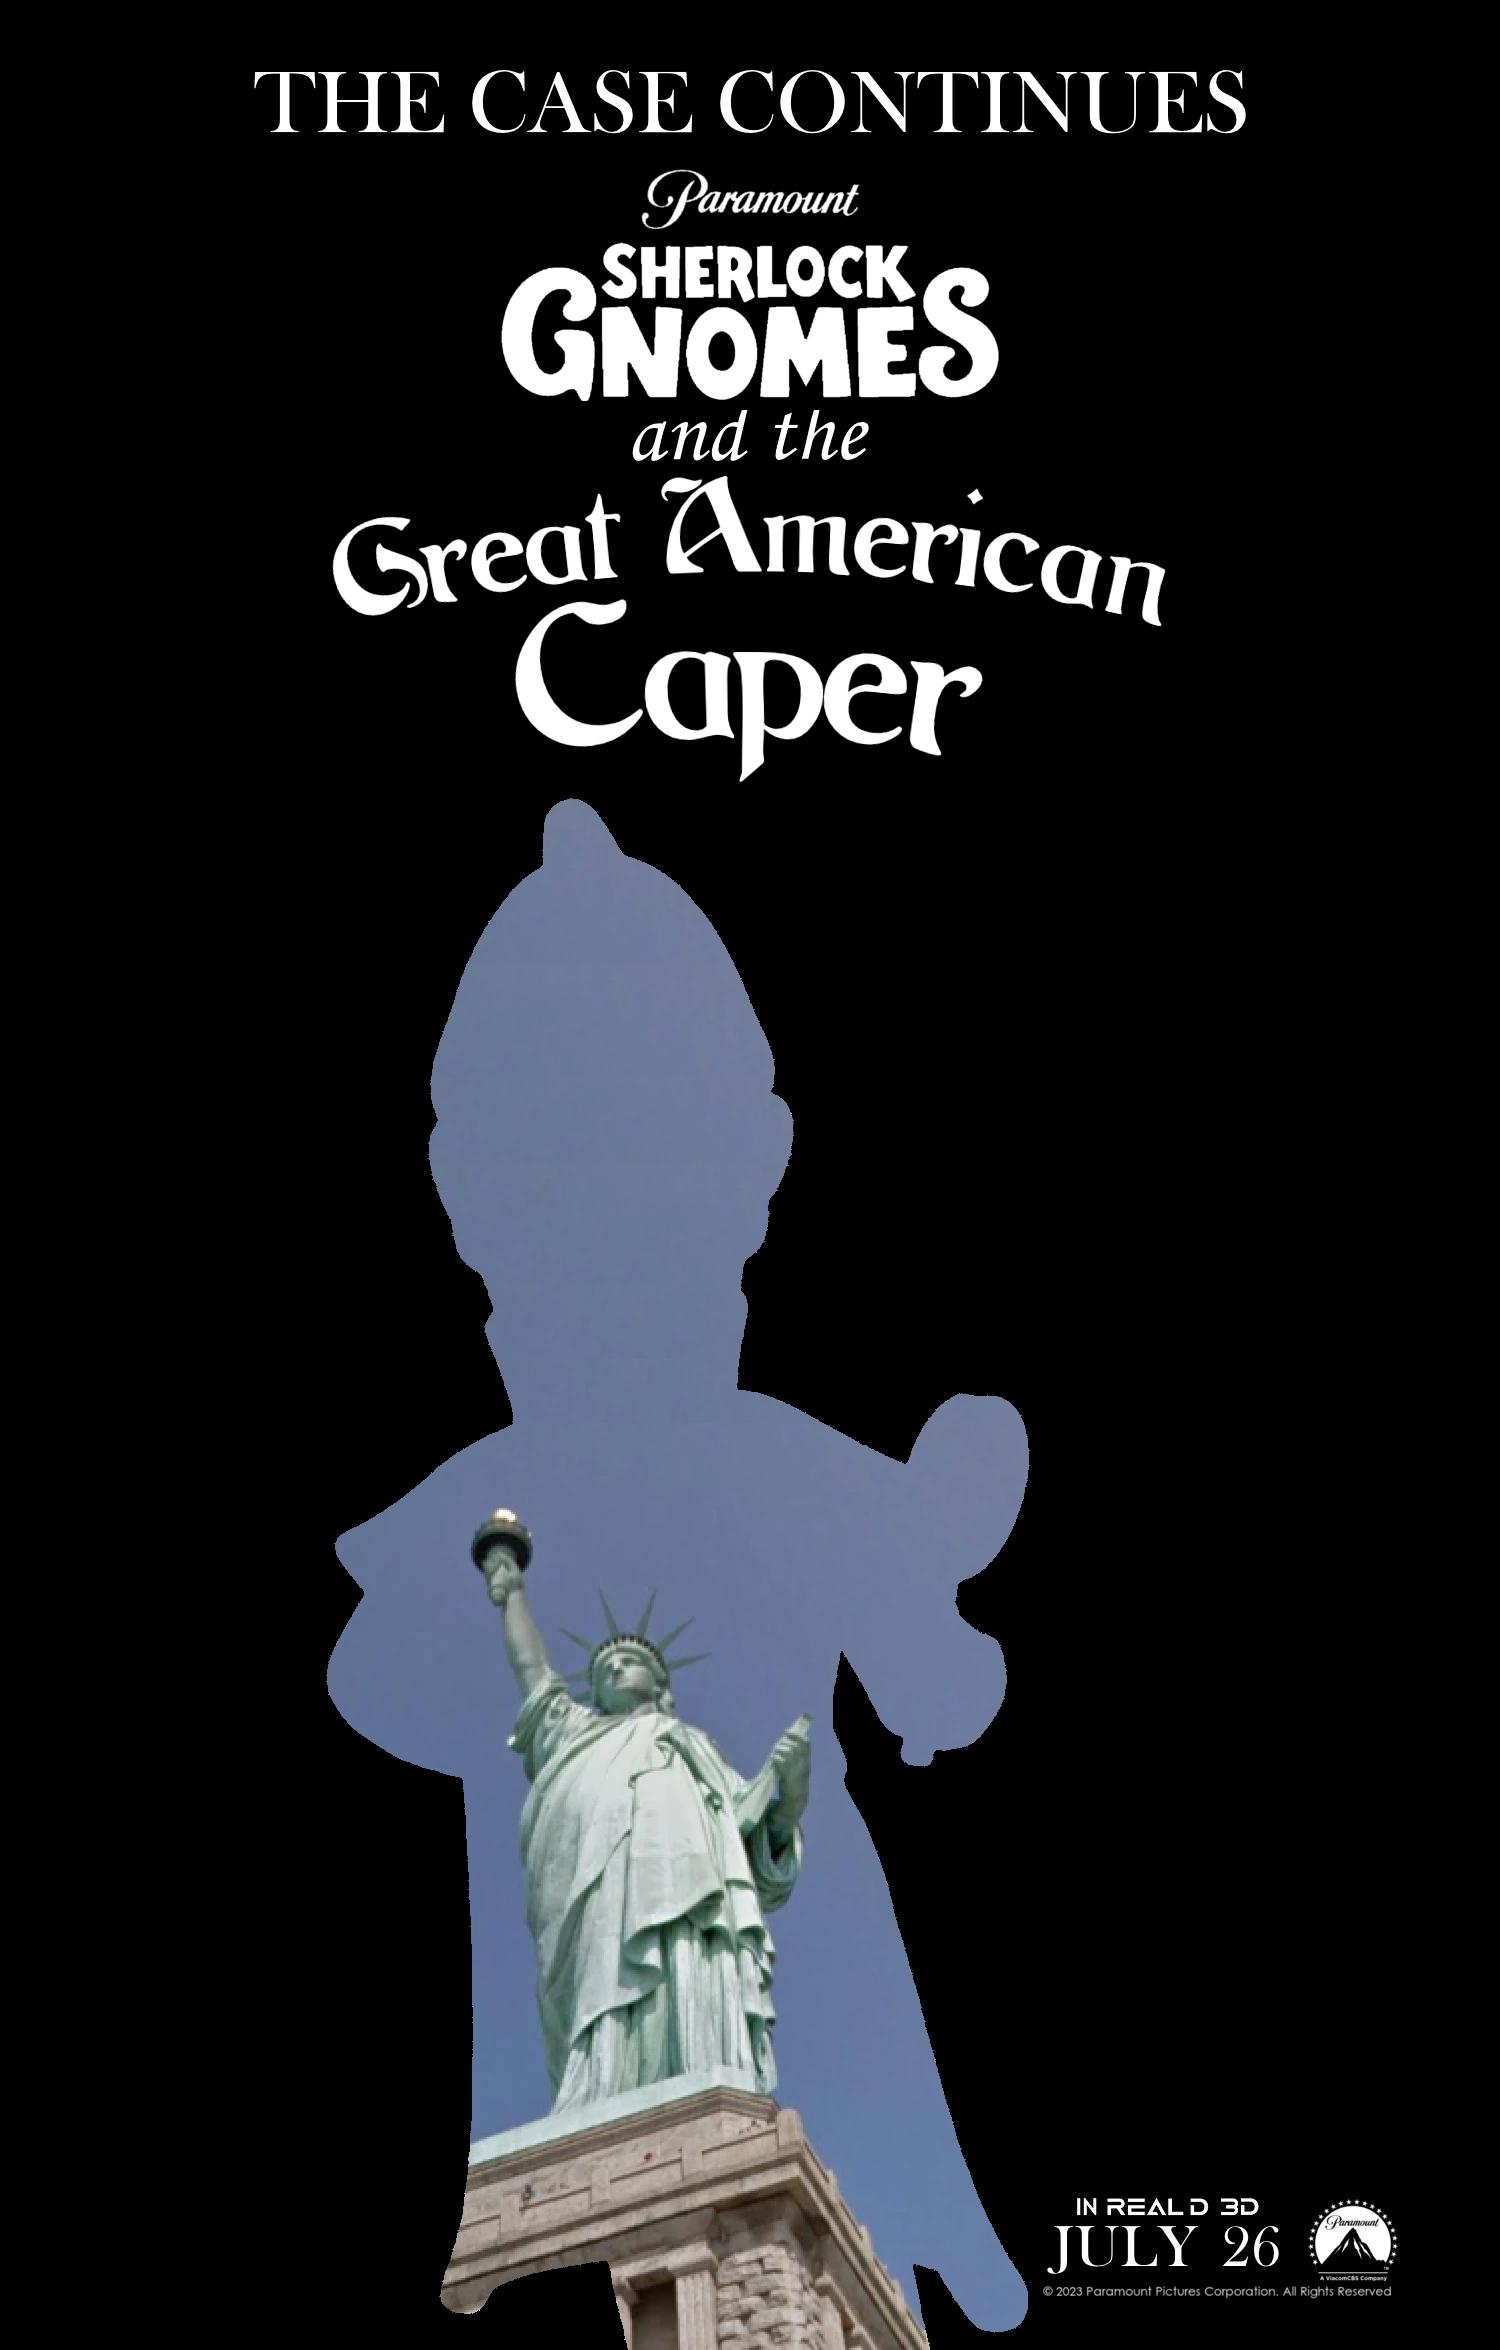 Sherlock Gnomes and the Great American Caper